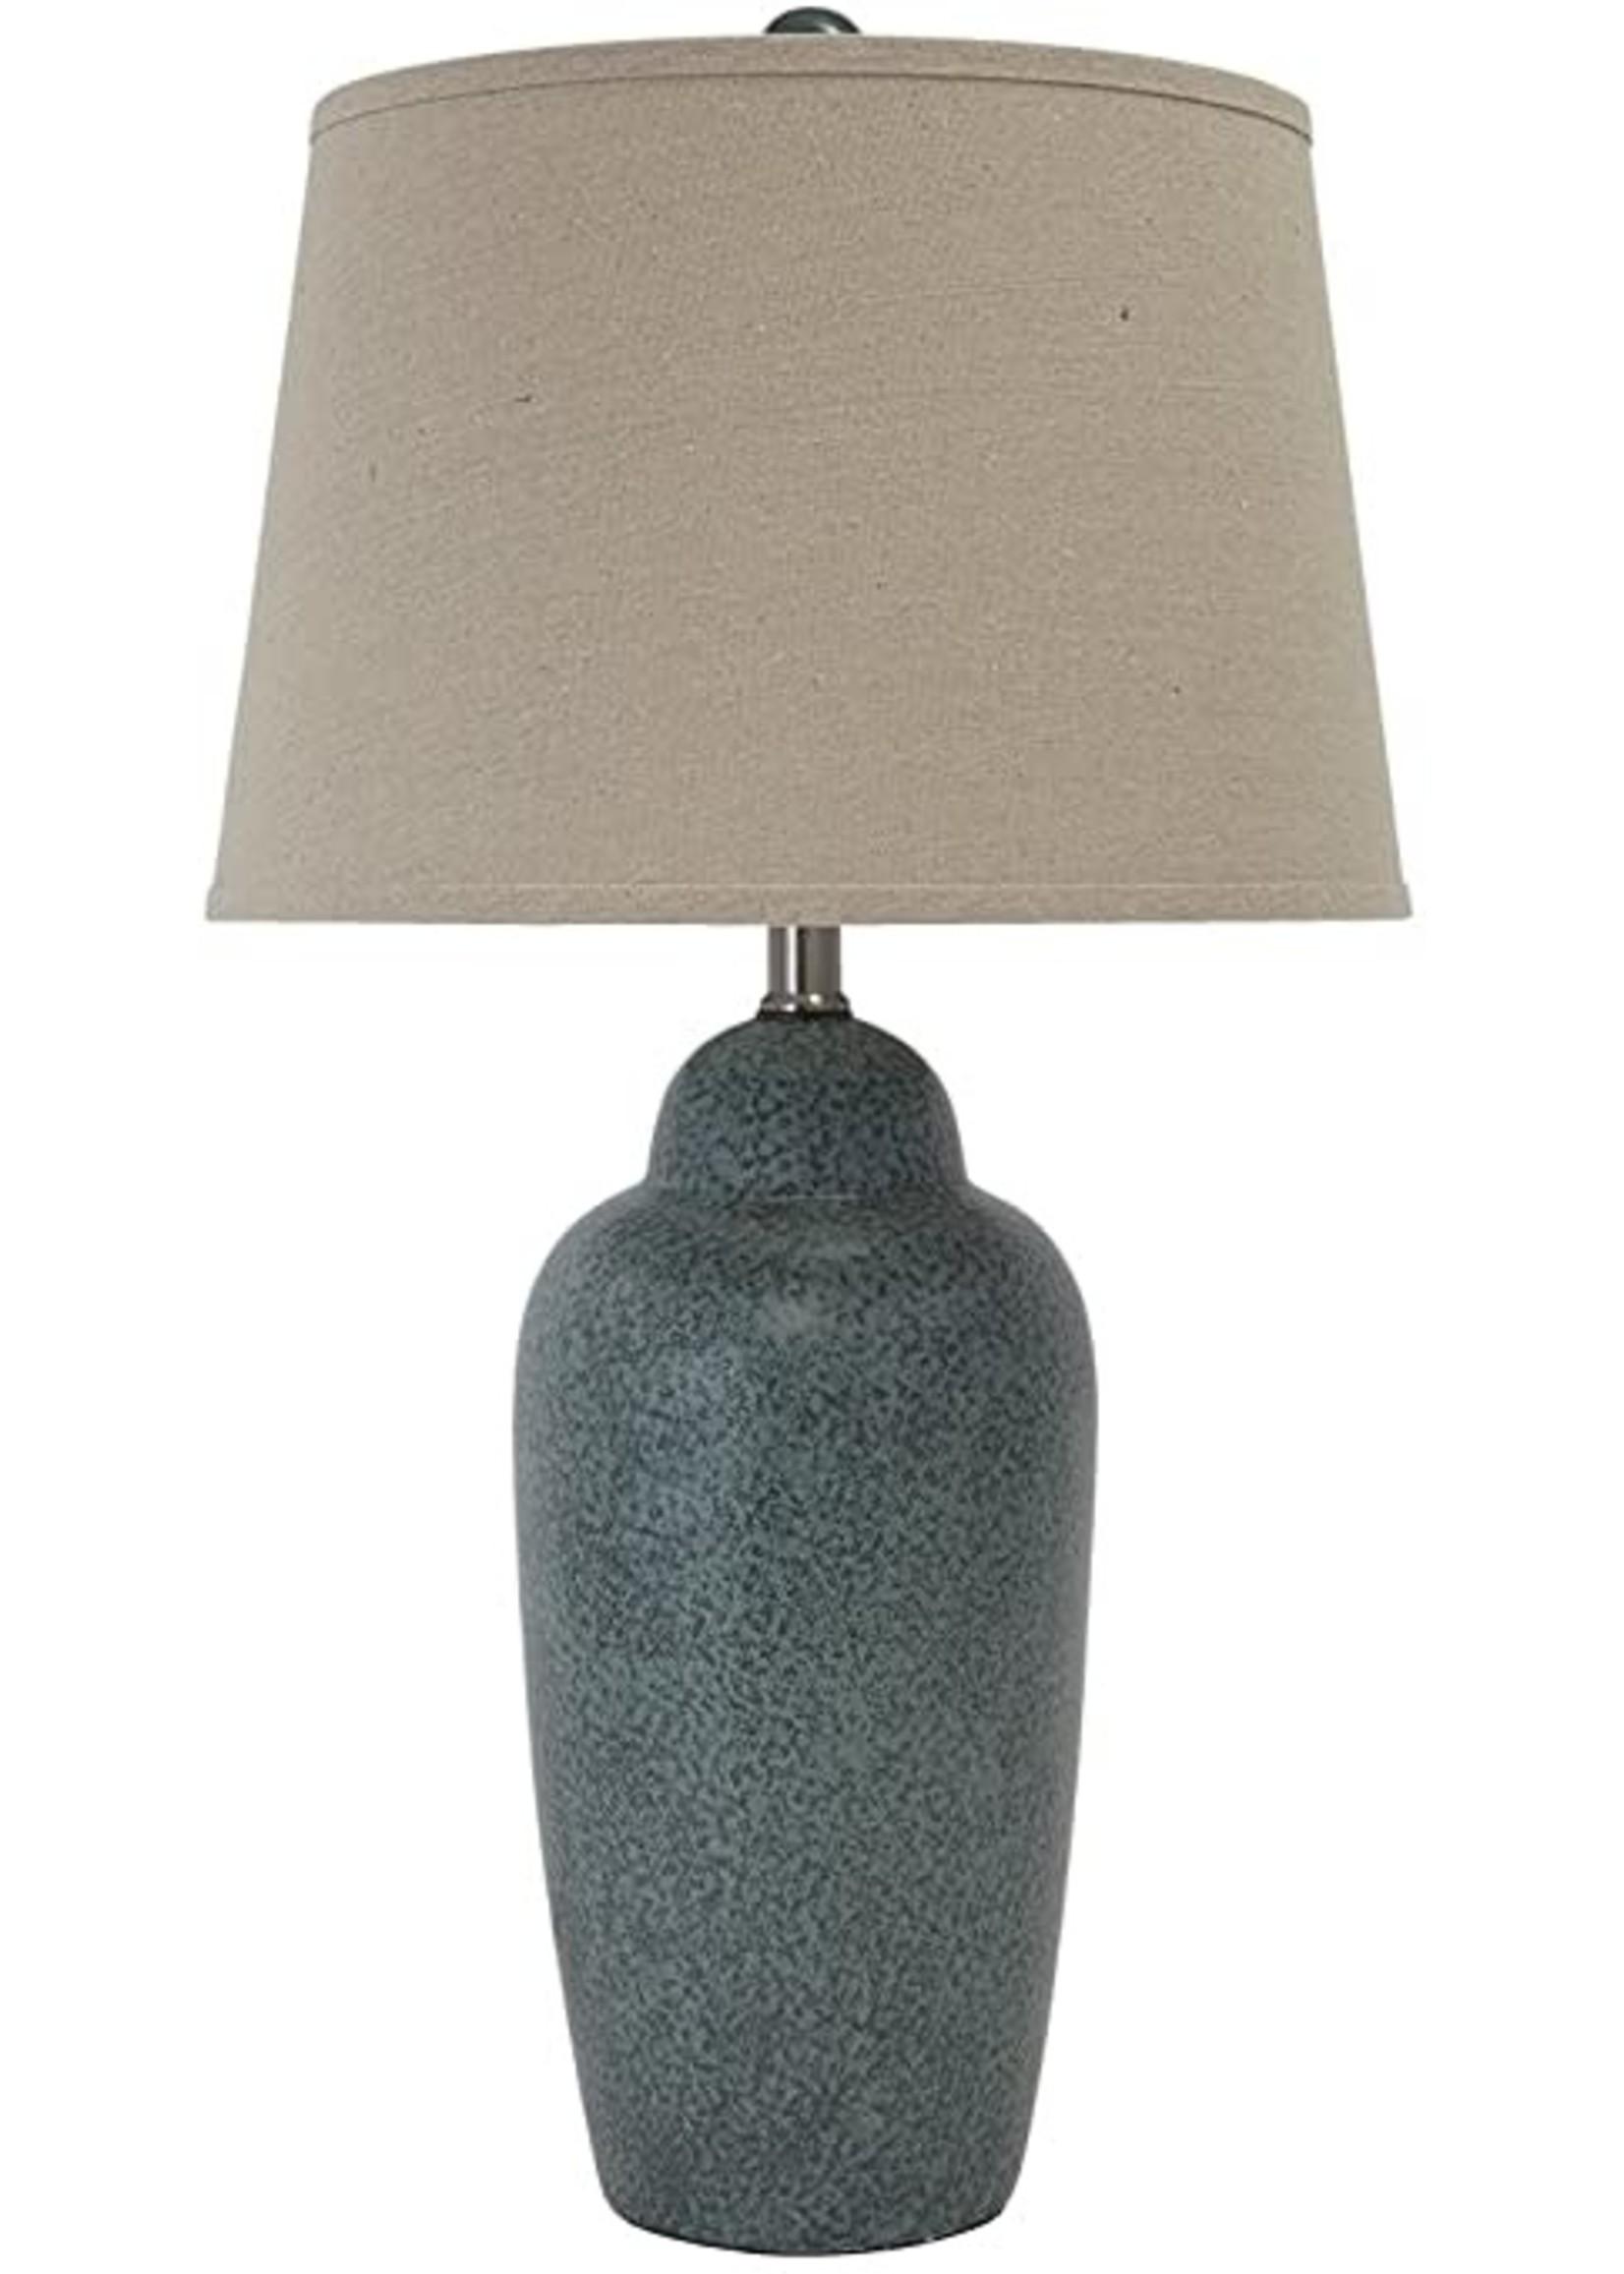 ASHLEY TABLE LAMP CERAMIC SAHER GREEN